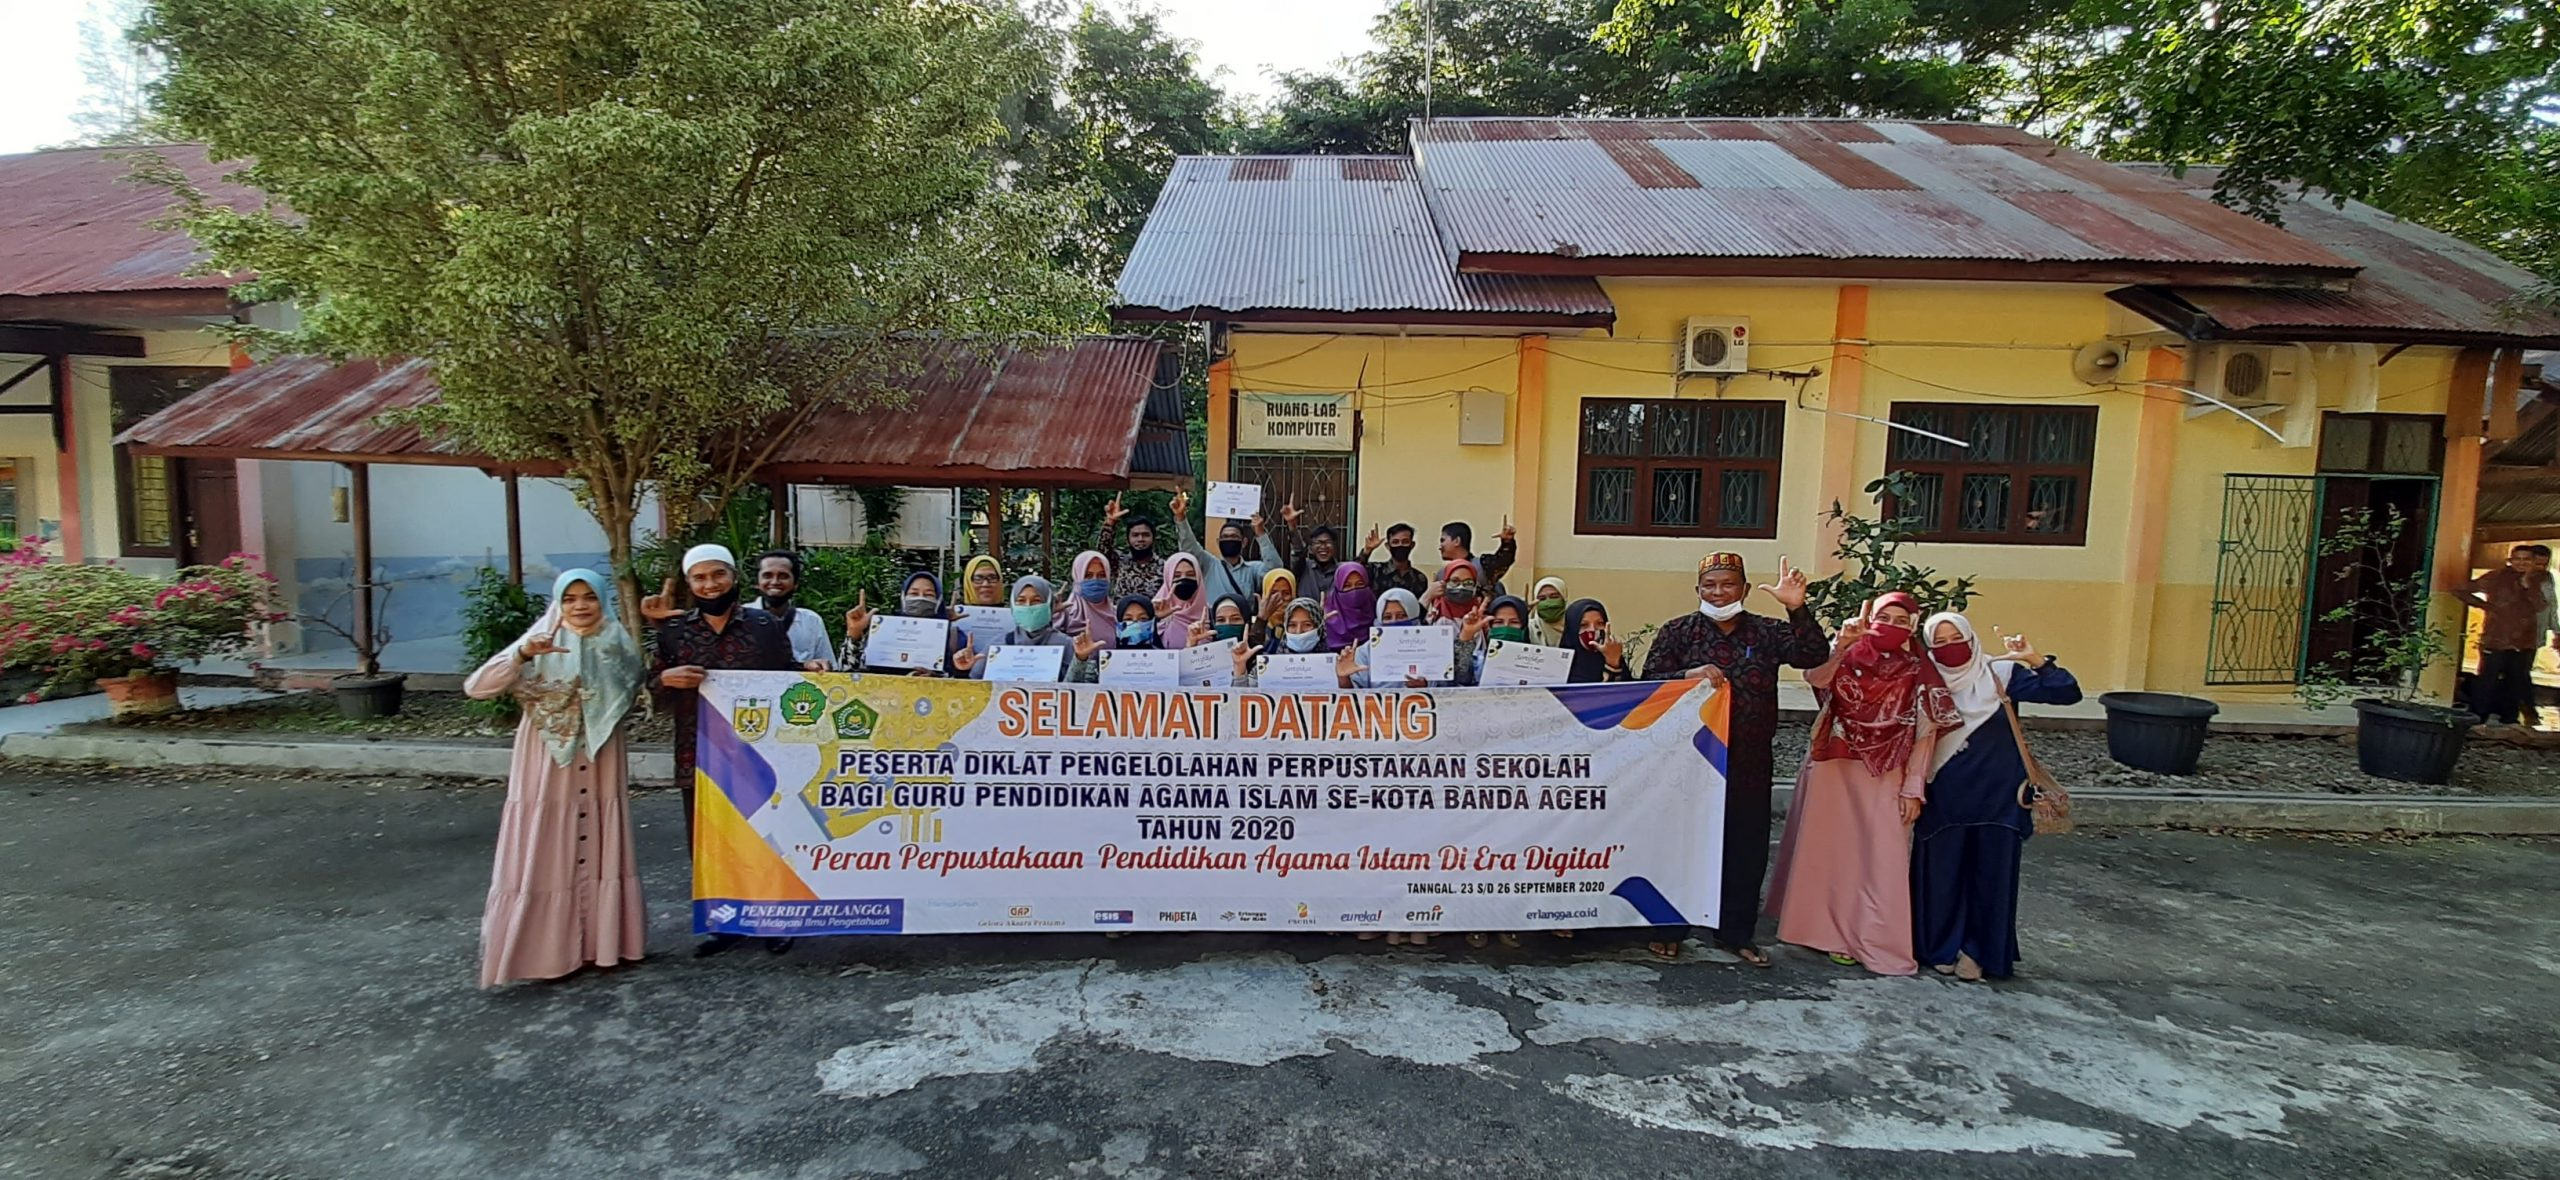 Diklat Pengelolaan Perpustakaan Sekolah Bagi Guru Pendidikan Agama Islam (PAI) Se- Kota Banda Aceh)